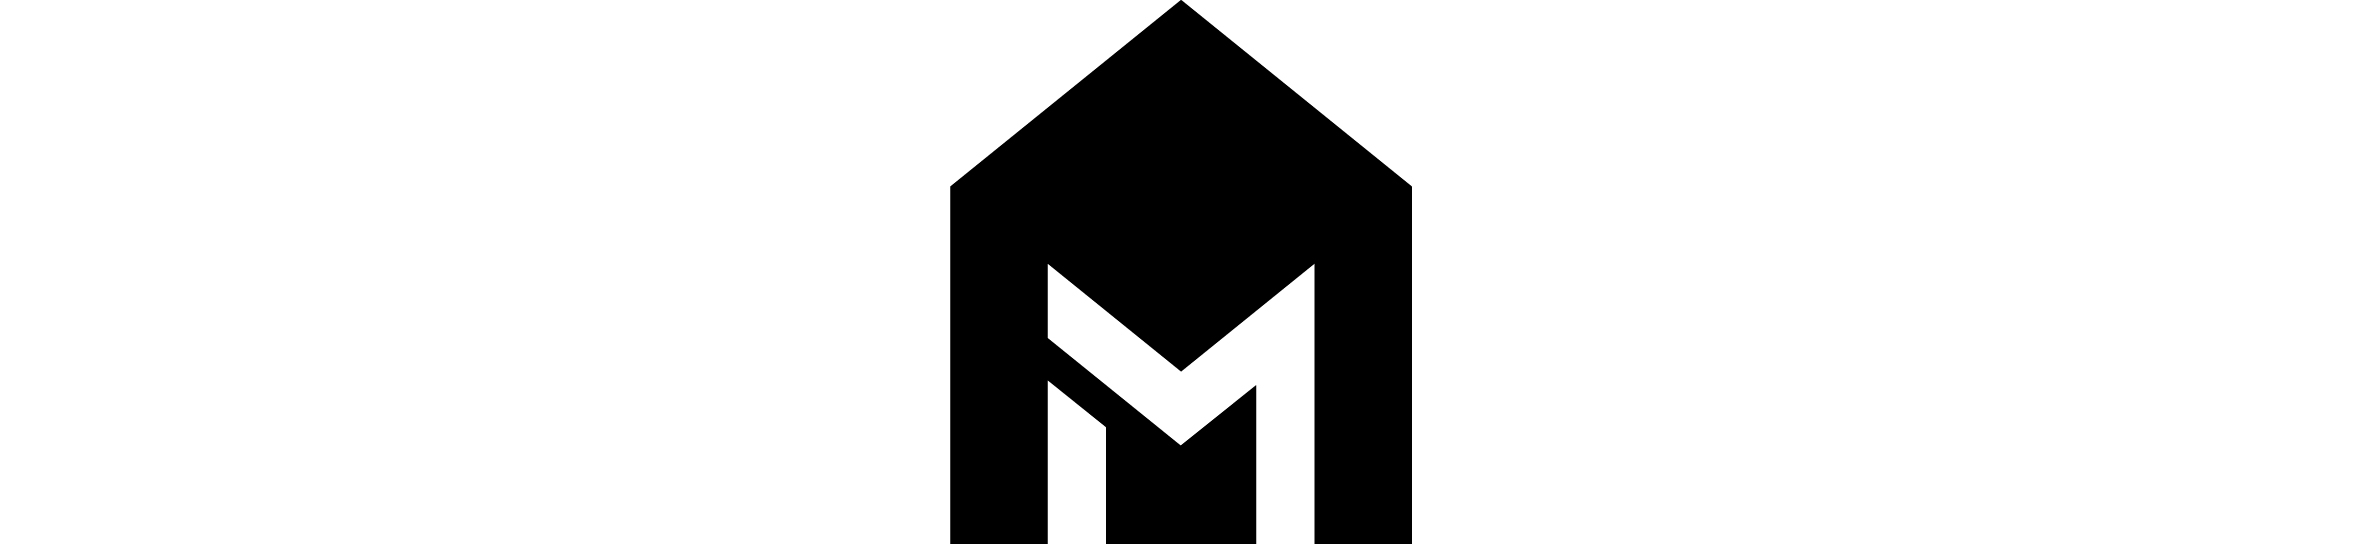 M2-01.jpg